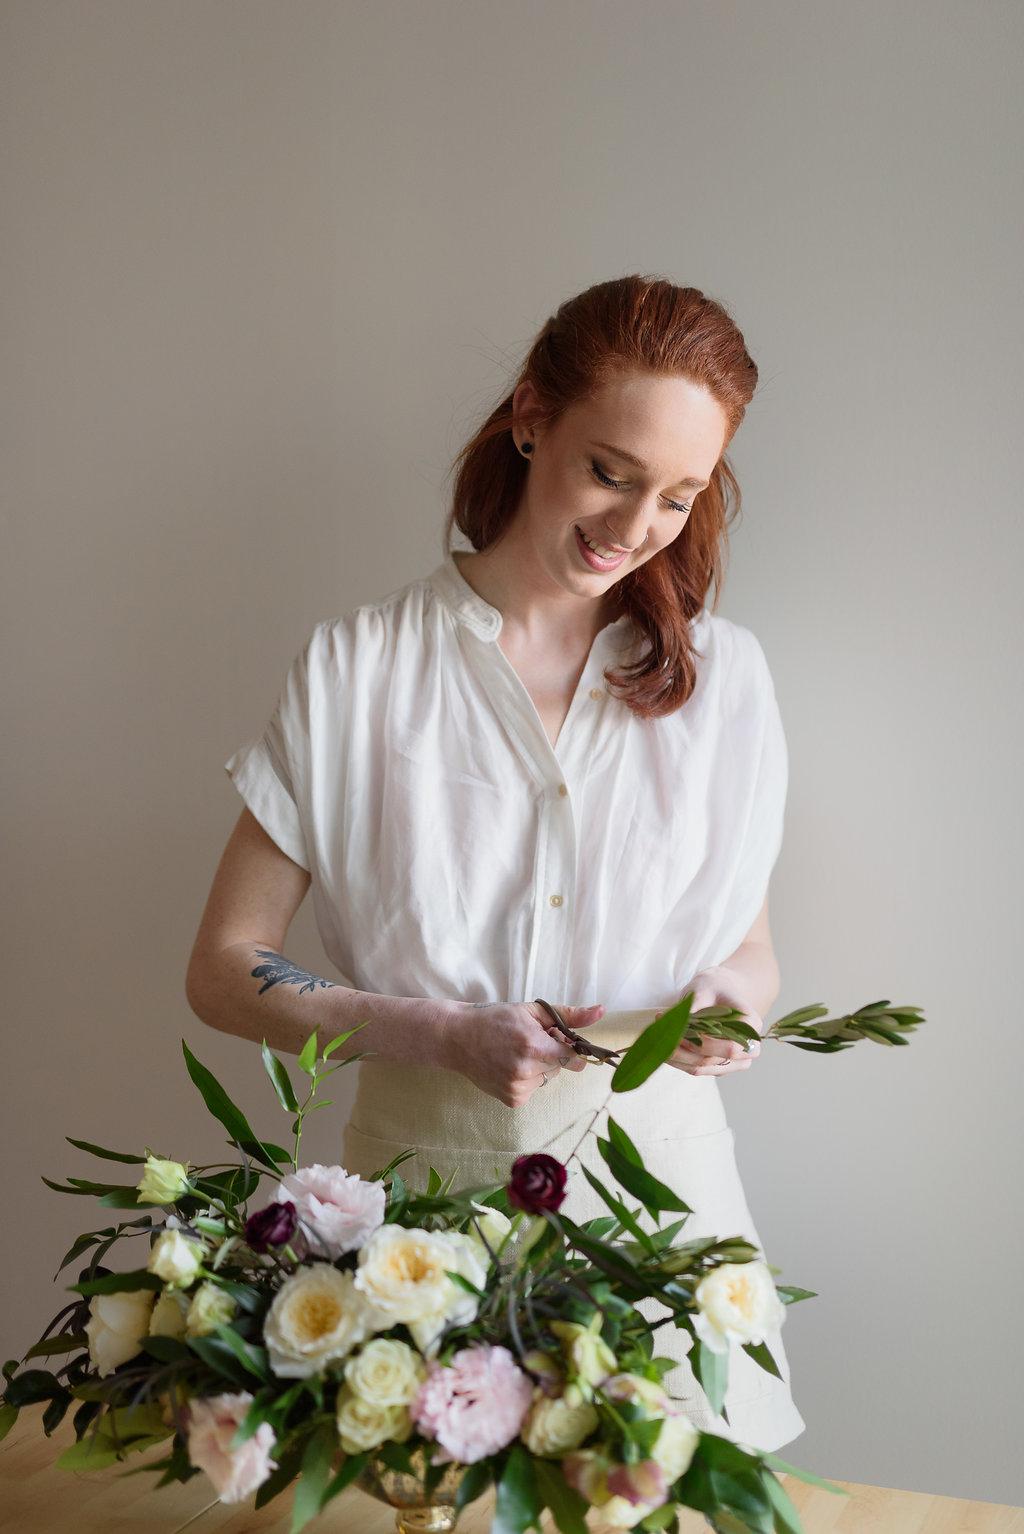 Toronto-wedding-florist-port-perry-florist